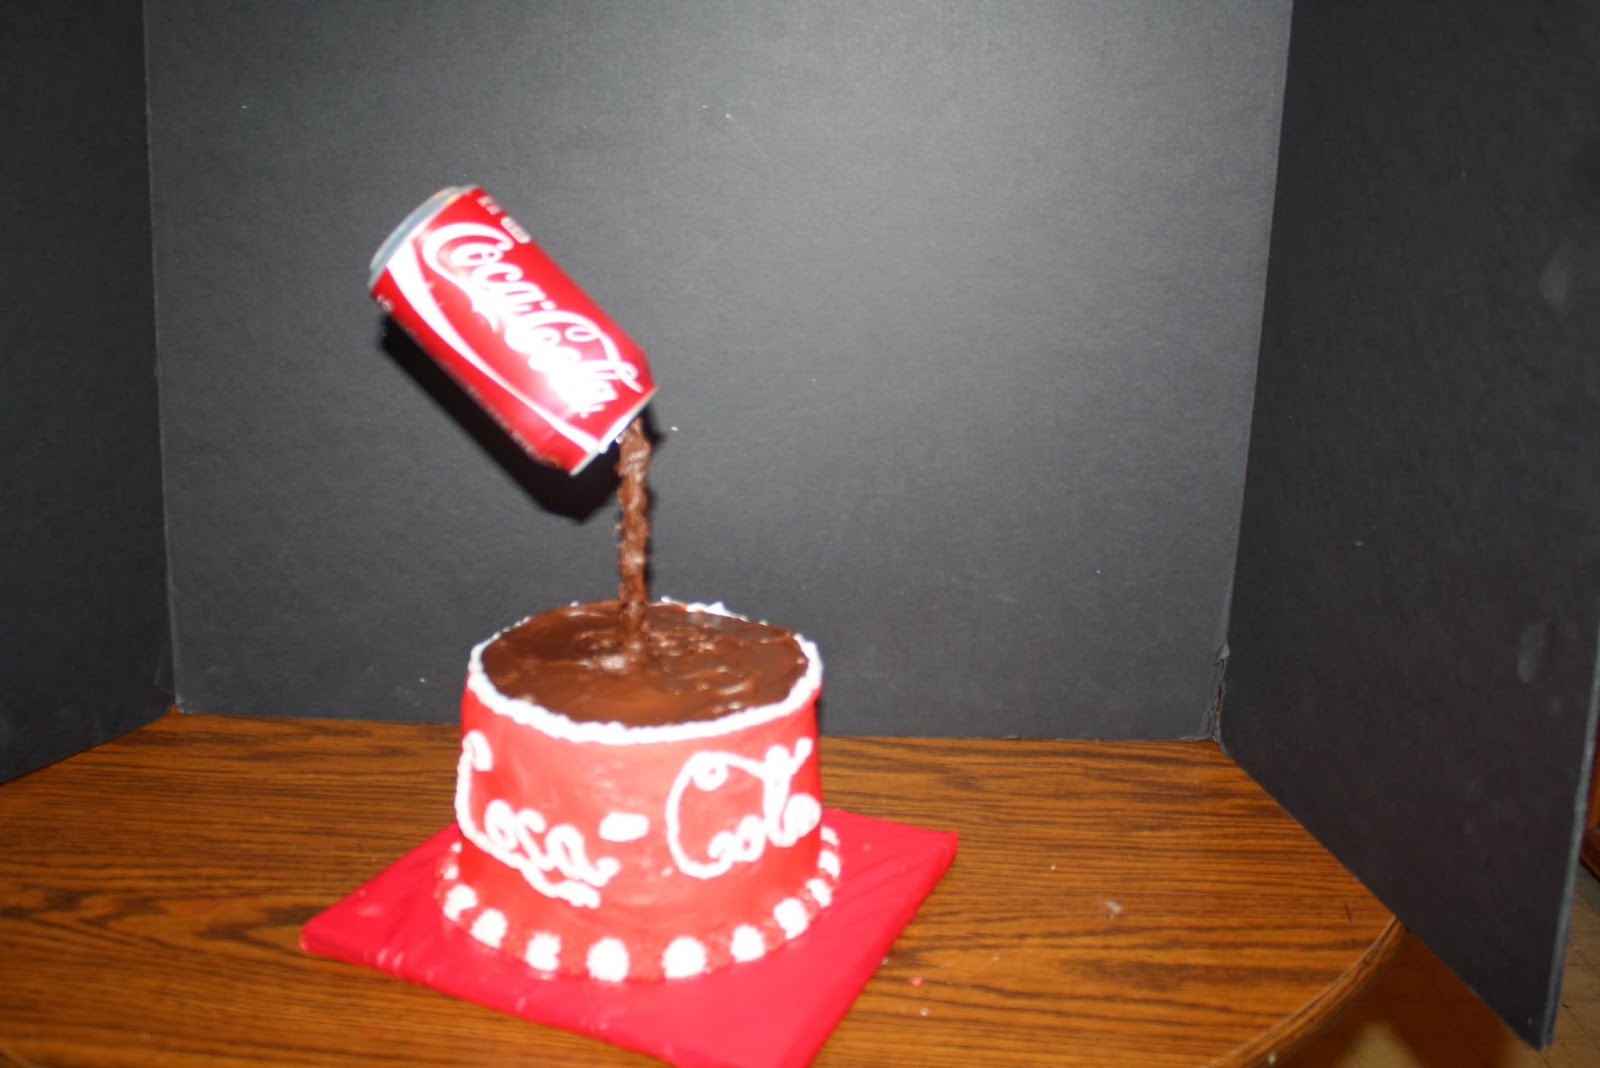 teresa's sweet boutique: Coca-Cola cake Pouring Coke can